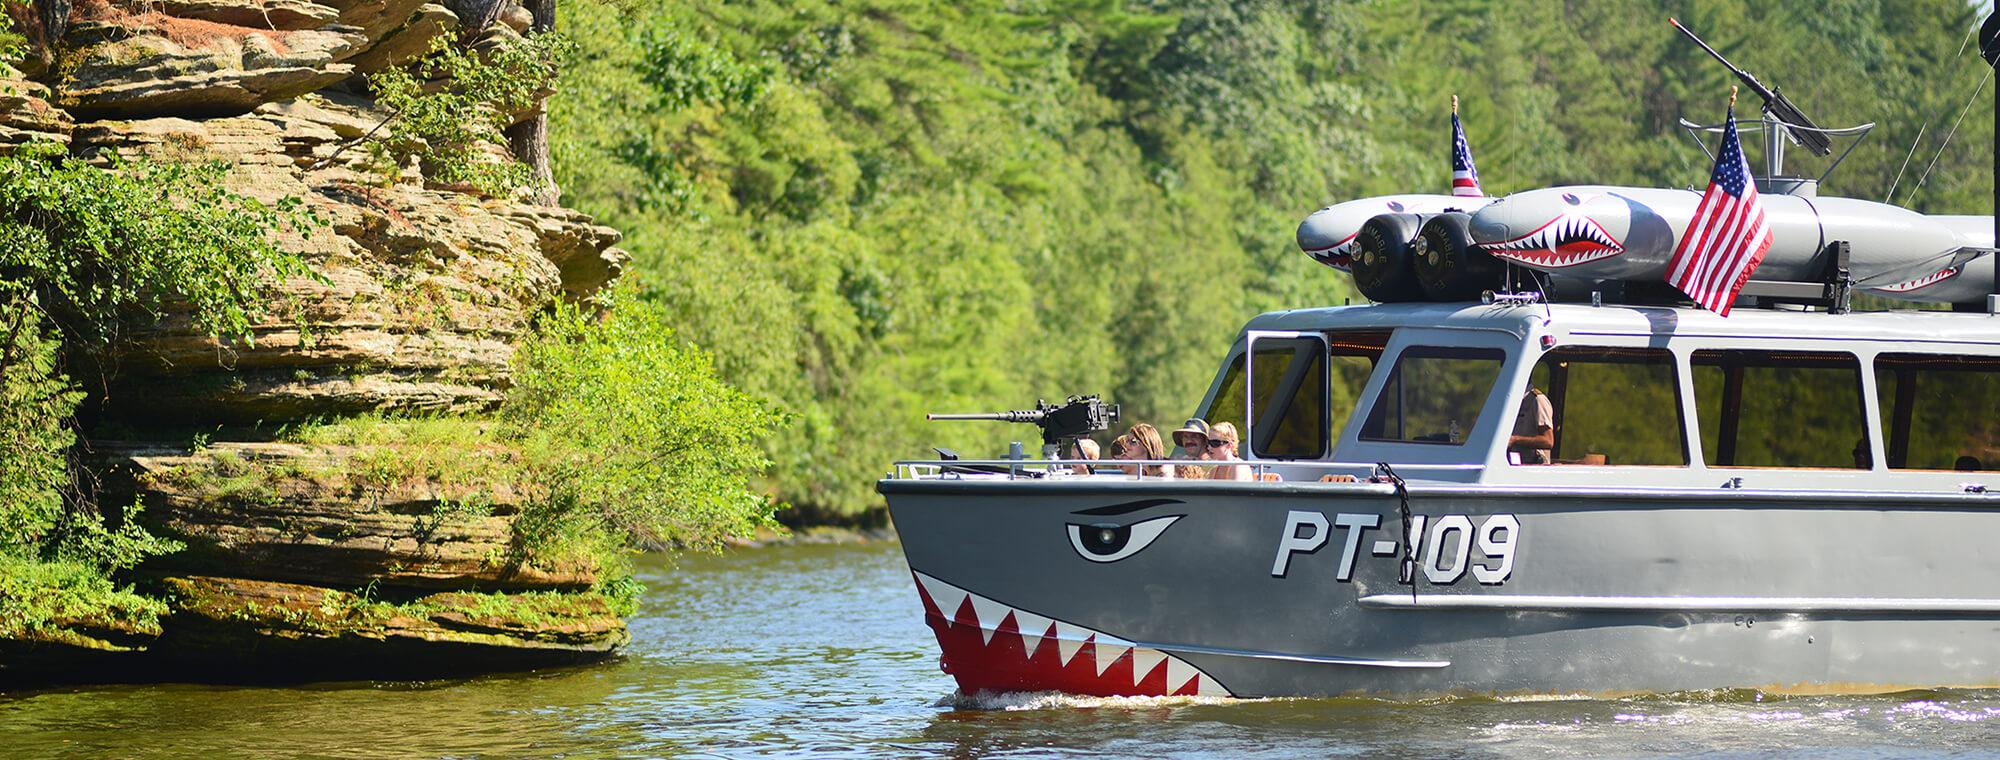 Boat Tours In The Upper Dells Dells Army Ducks